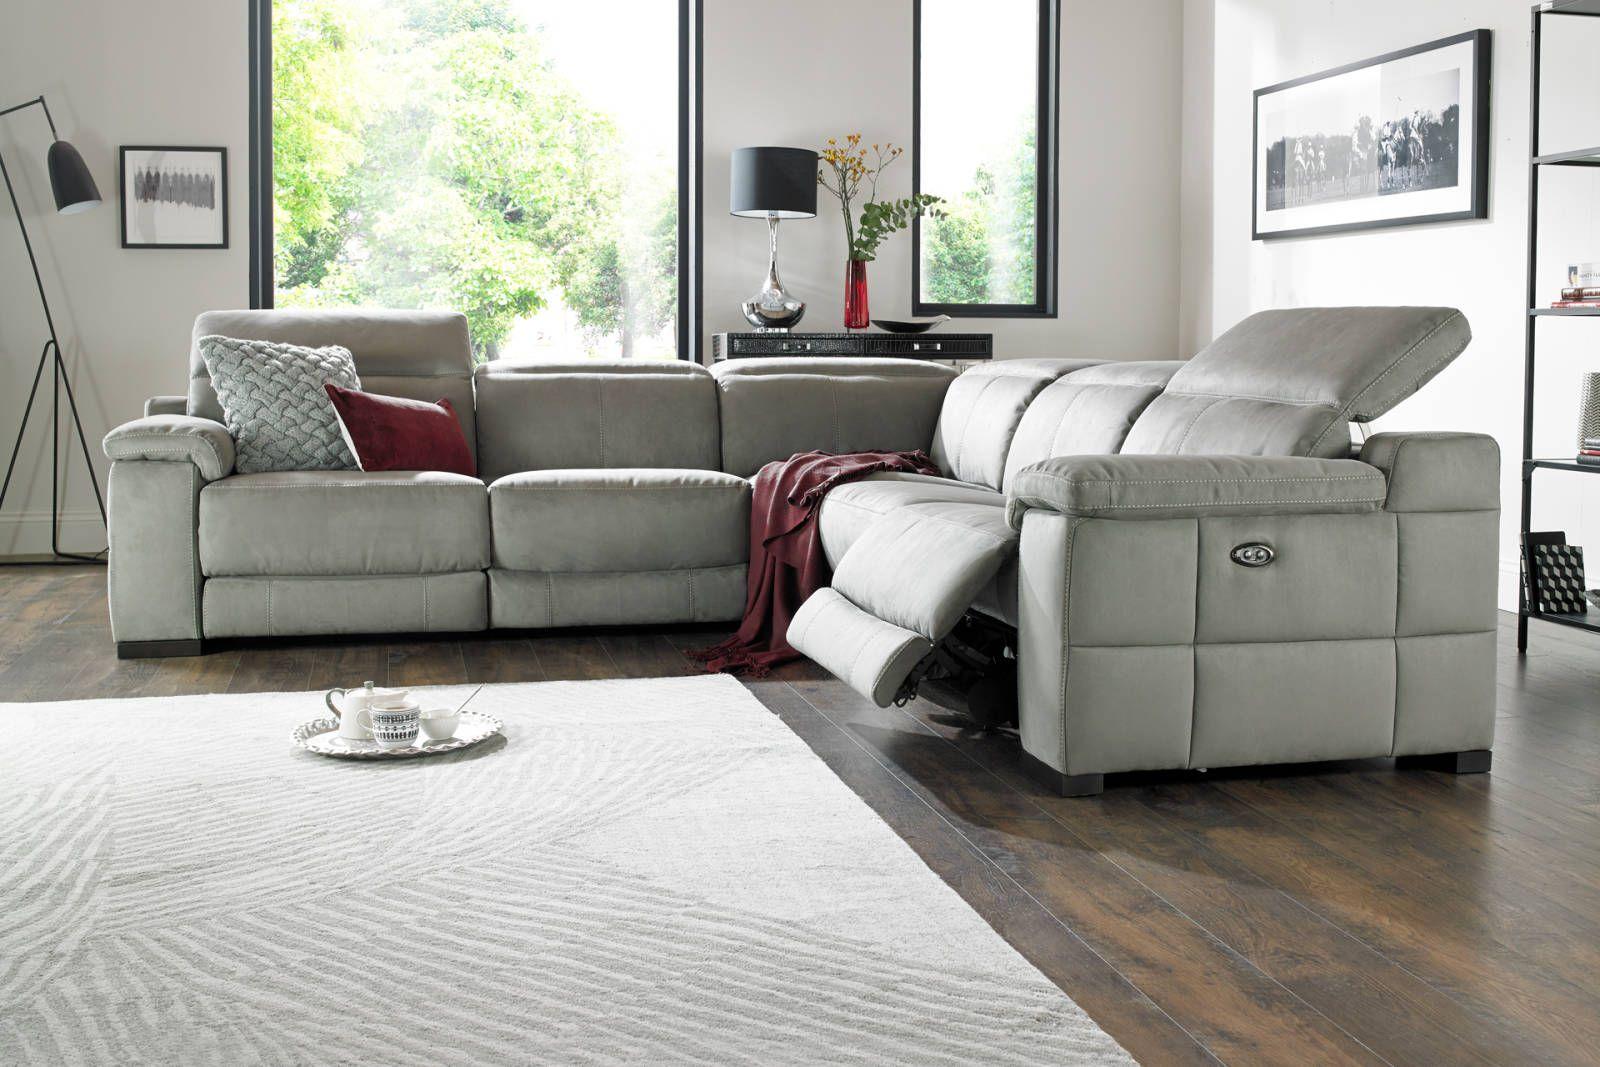 Laurence Sofology New Living Room Recliner Corner Sofa Sofa